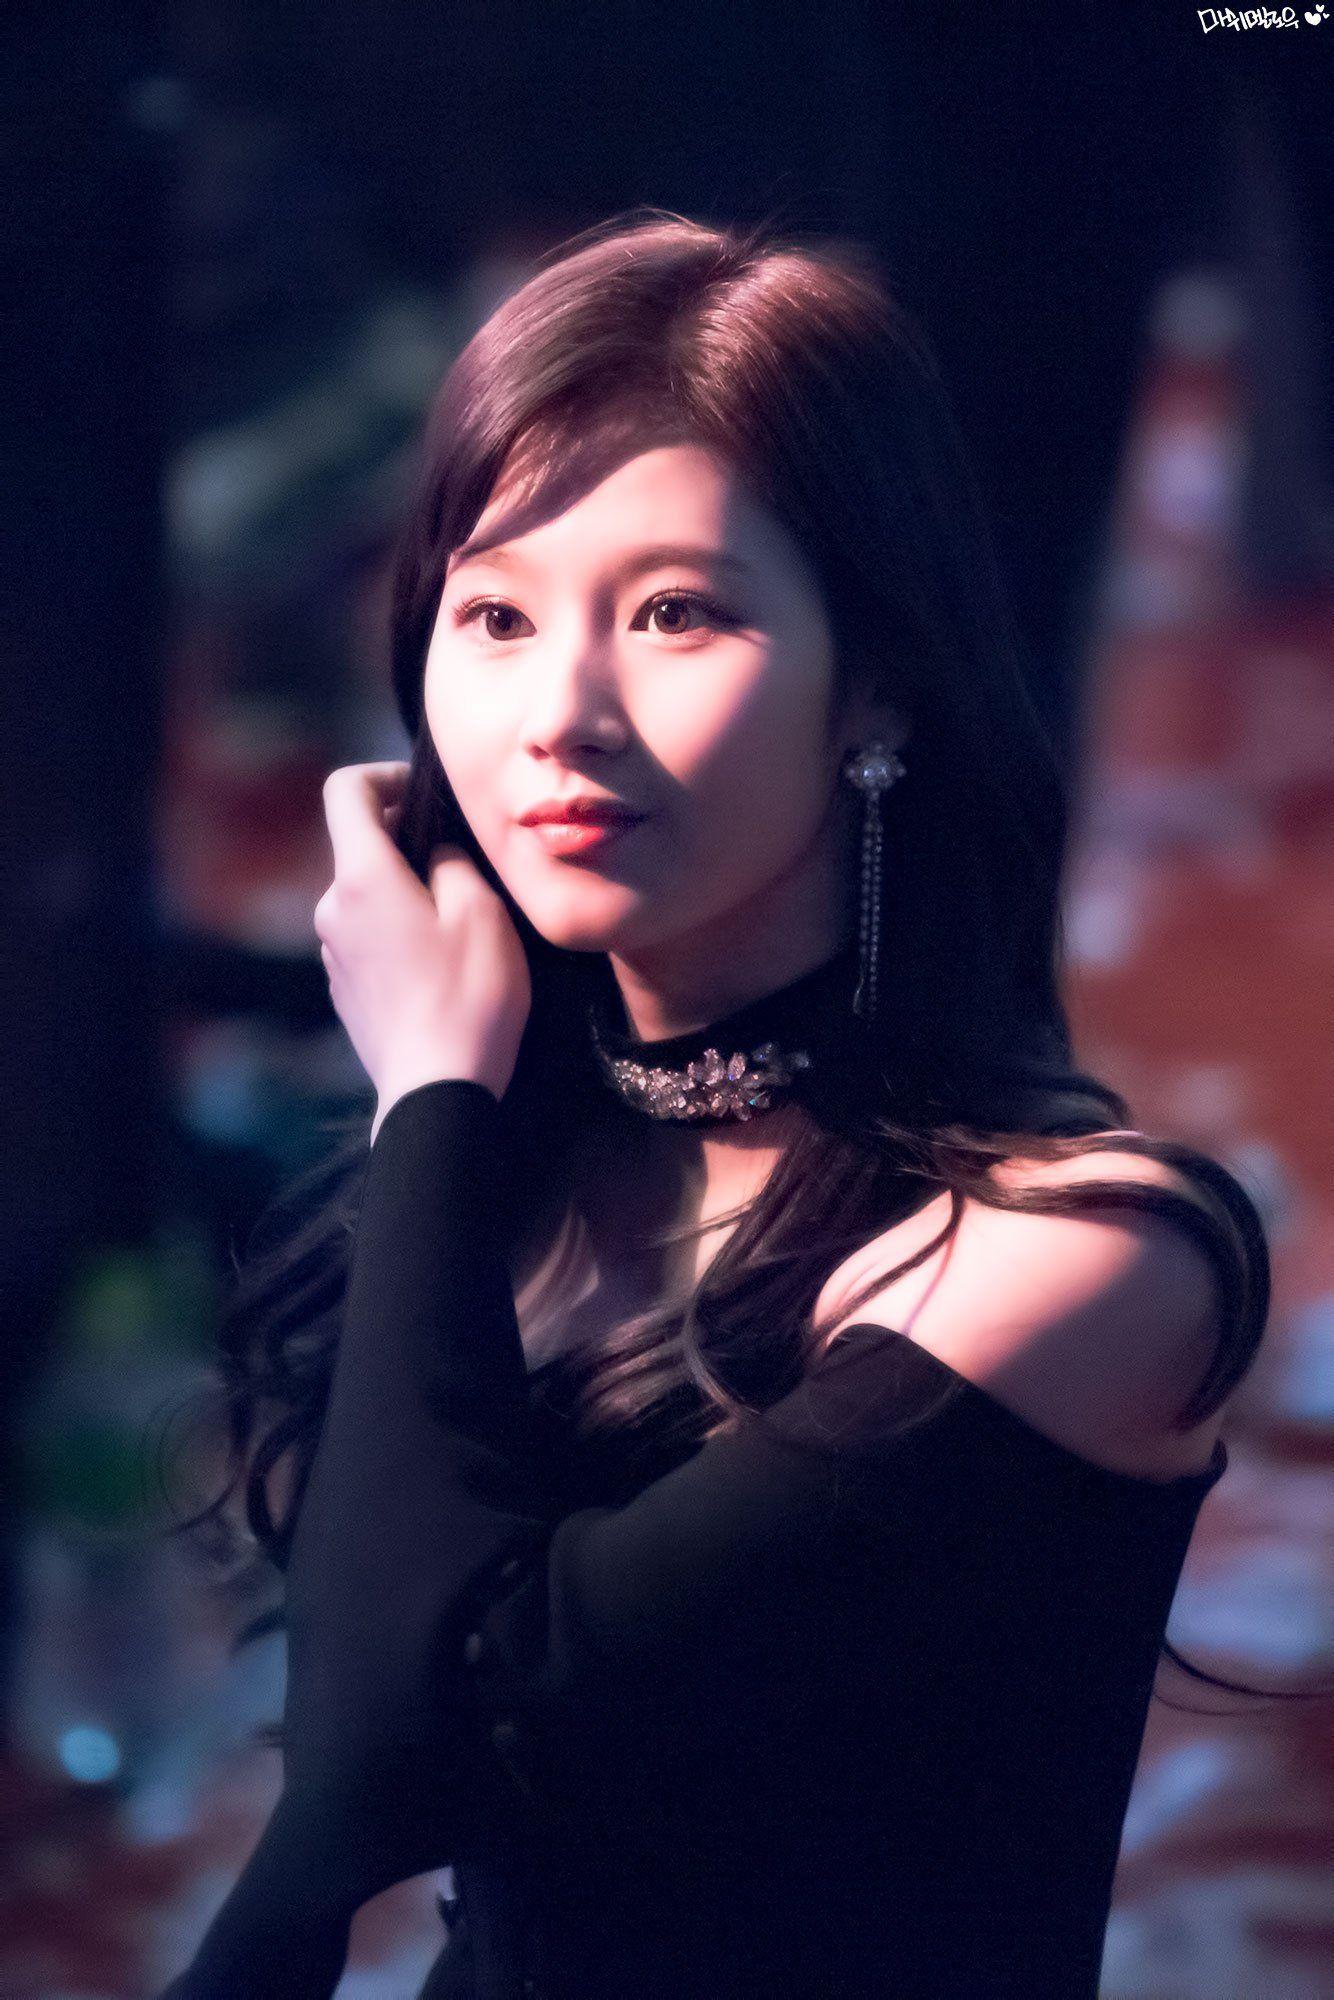 Pin By John Aries Galman On K Pop Idol Twice Sana Minatozaki Sana Kpop Idol